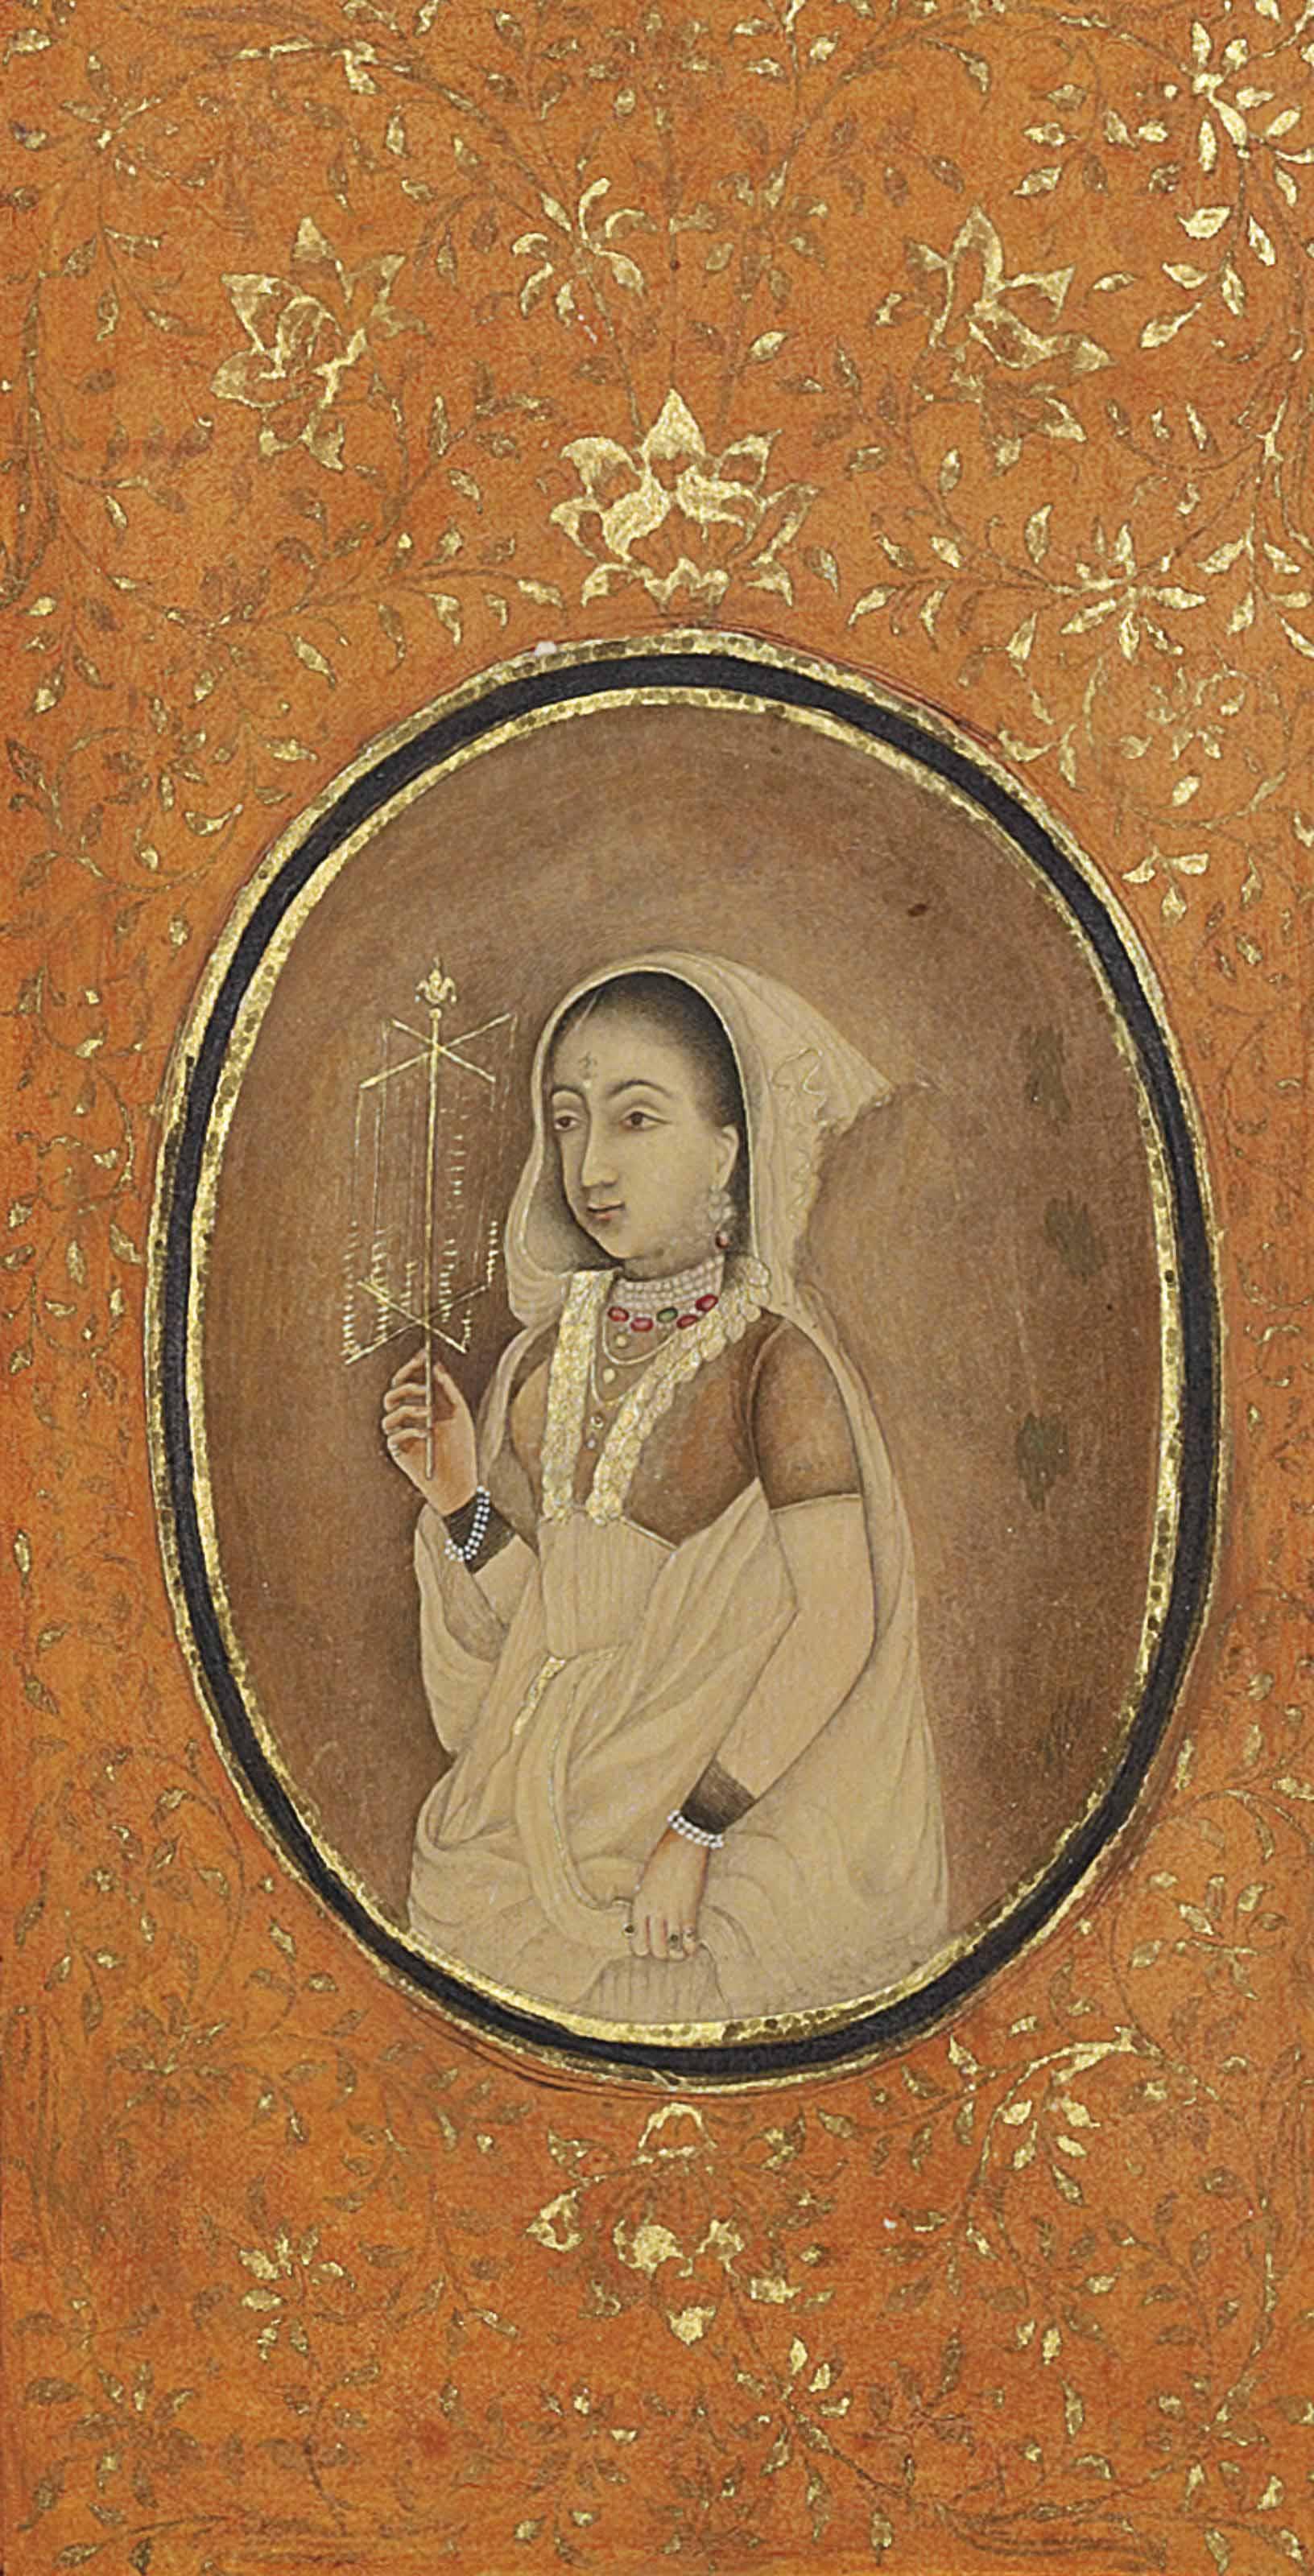 A HINDU LADY IN EUROPEAN-INSPI